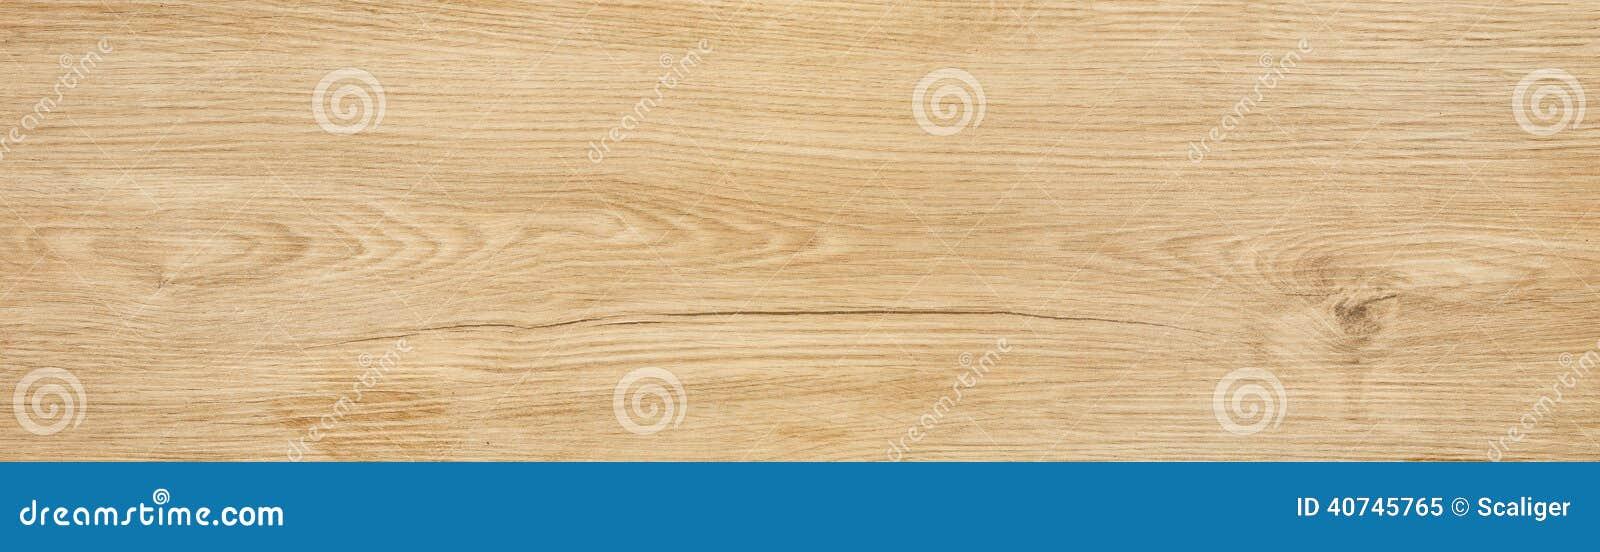 древесина текстуры теней предпосылки коричневая